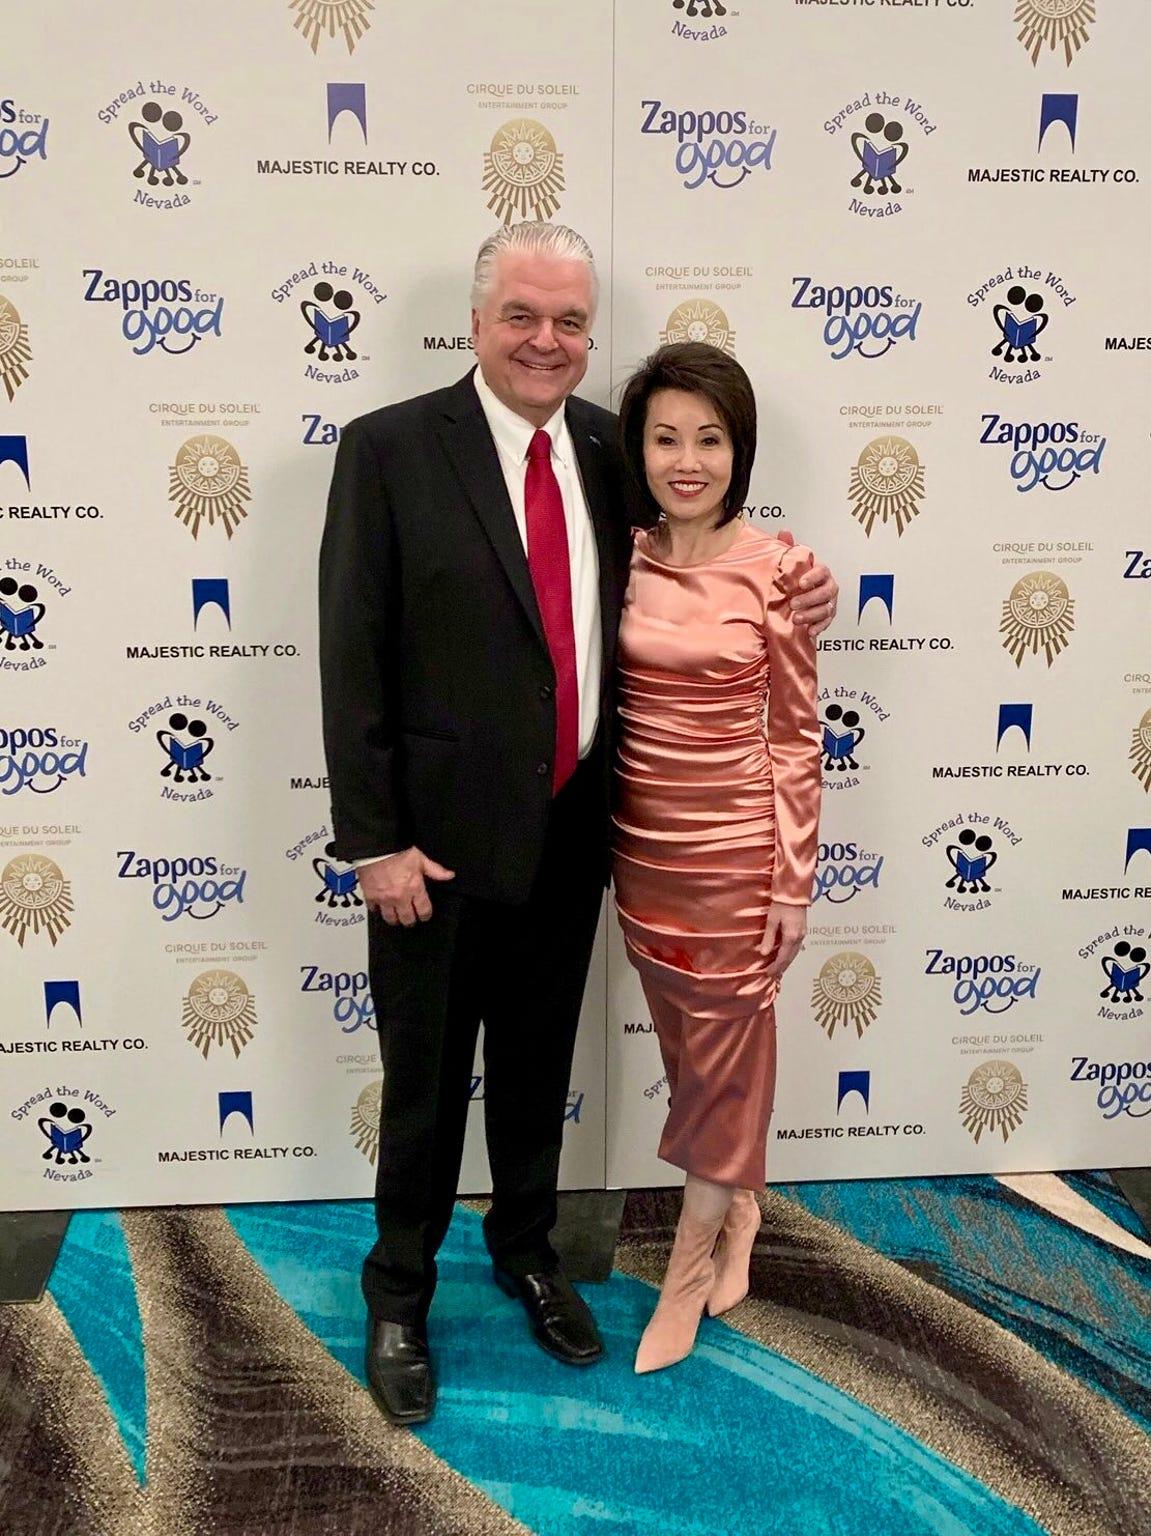 Gov. Steve Sisolak and his wife Kathy.